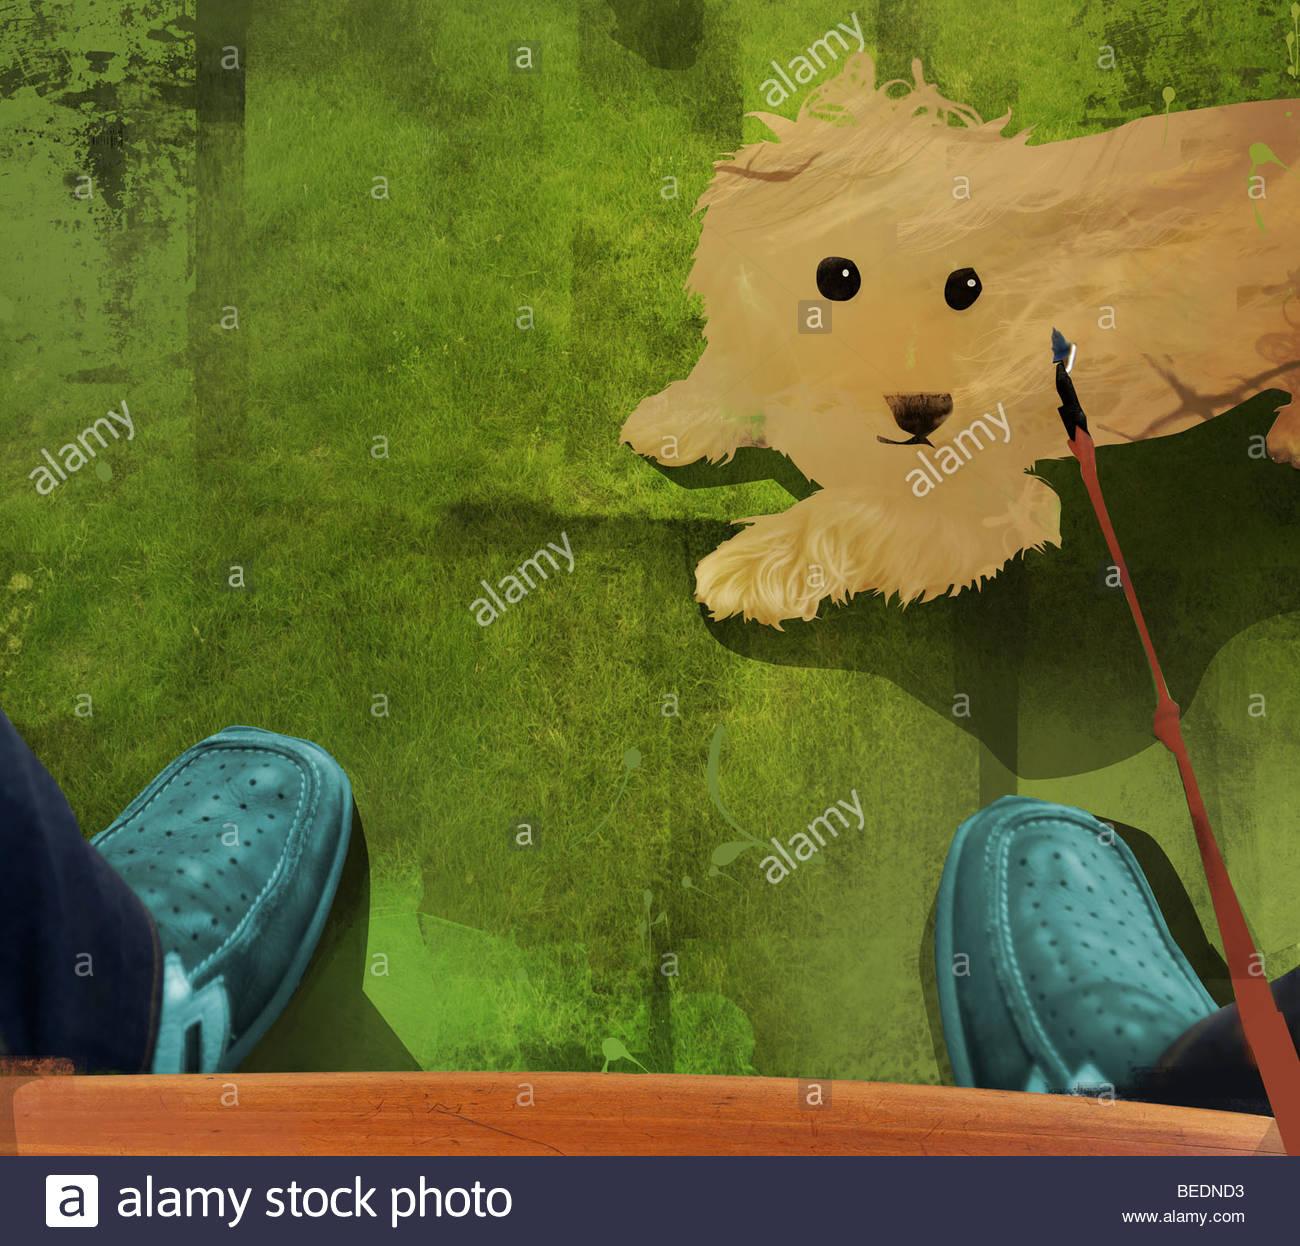 Propietario mirando perro mascota en correa Imagen De Stock